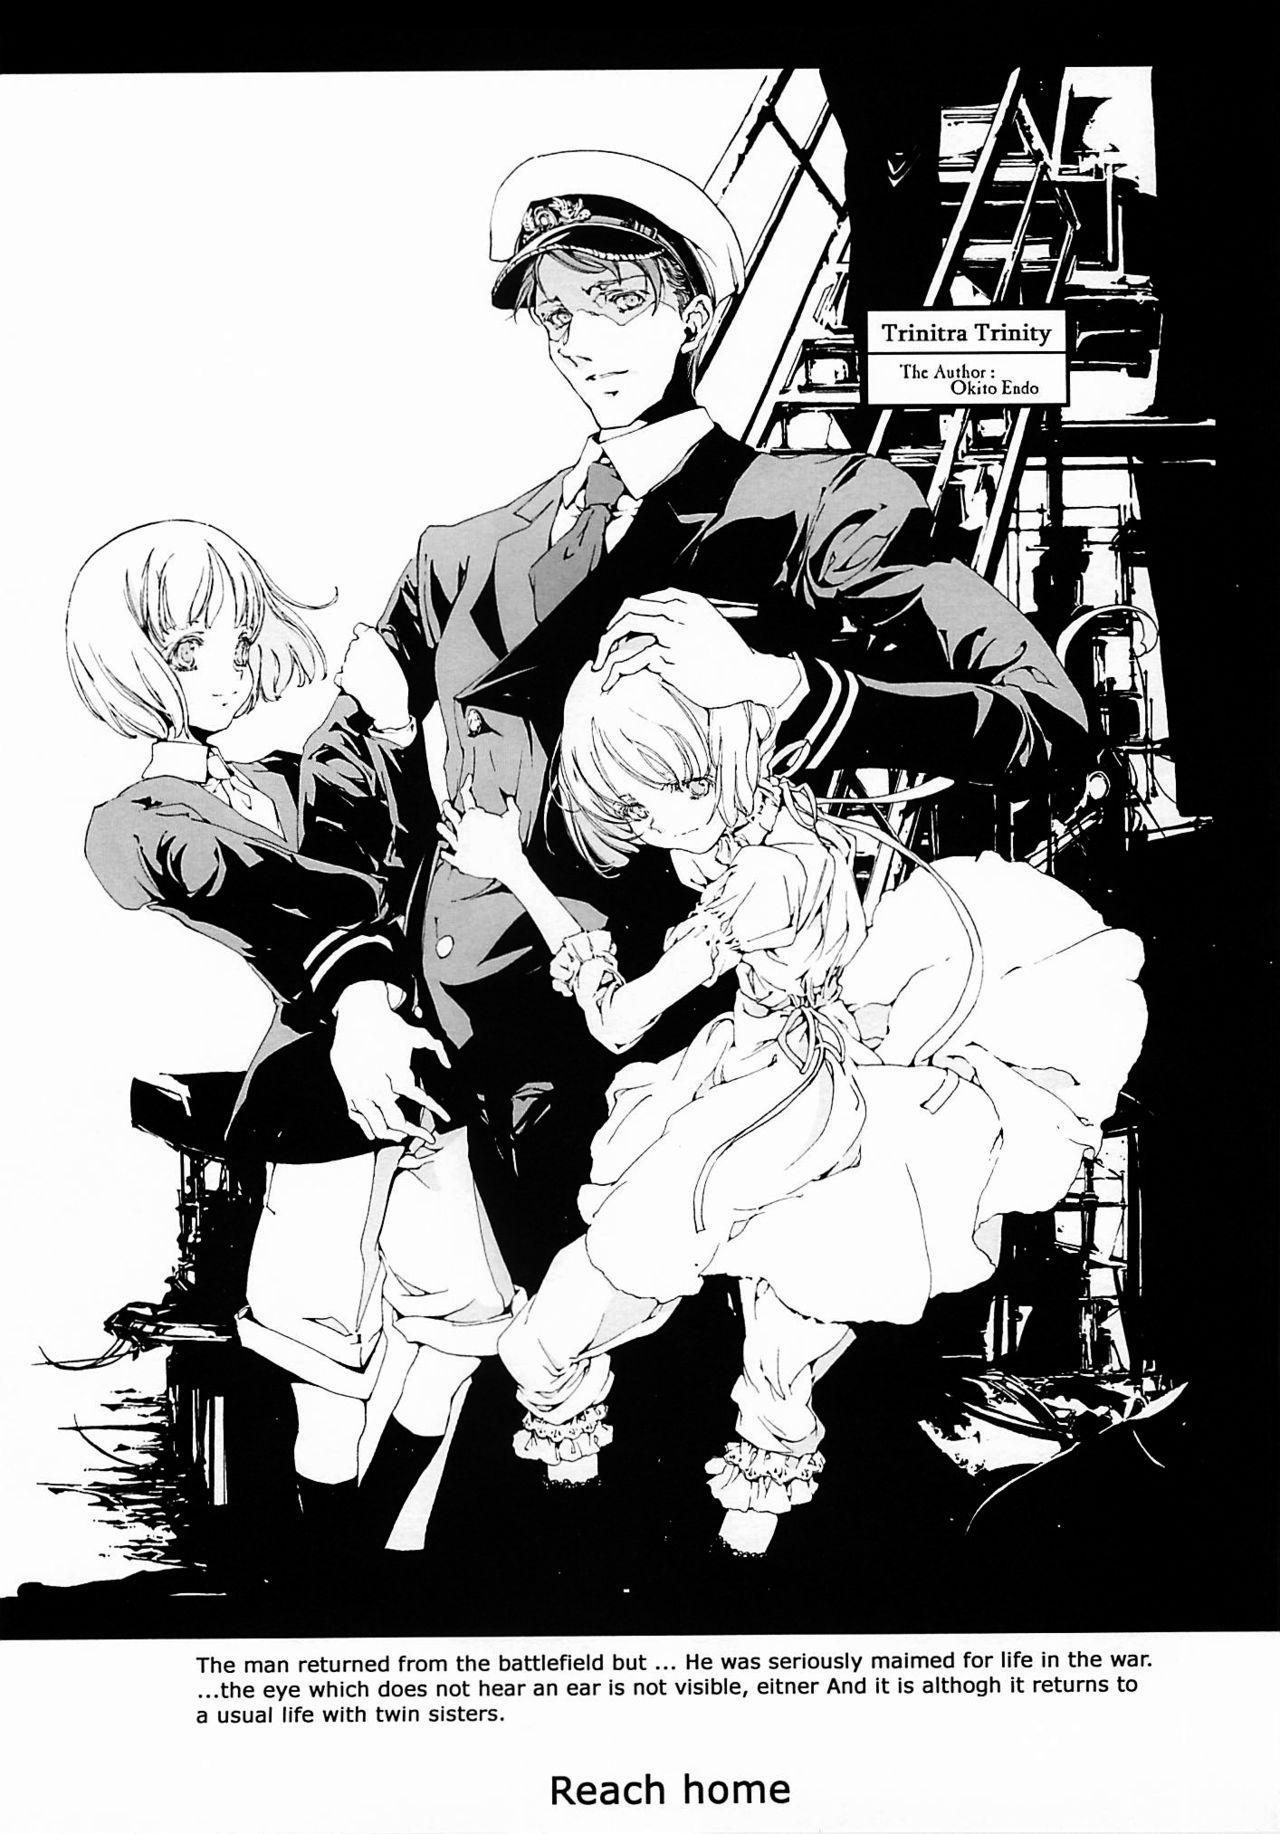 (CR37) [70 Nenshiki Yuukyuu Kikan (Endou Okito)] ORGAN-Tino  01-02[Chinese] [拾荒者汉化组] [Incomplete] 74